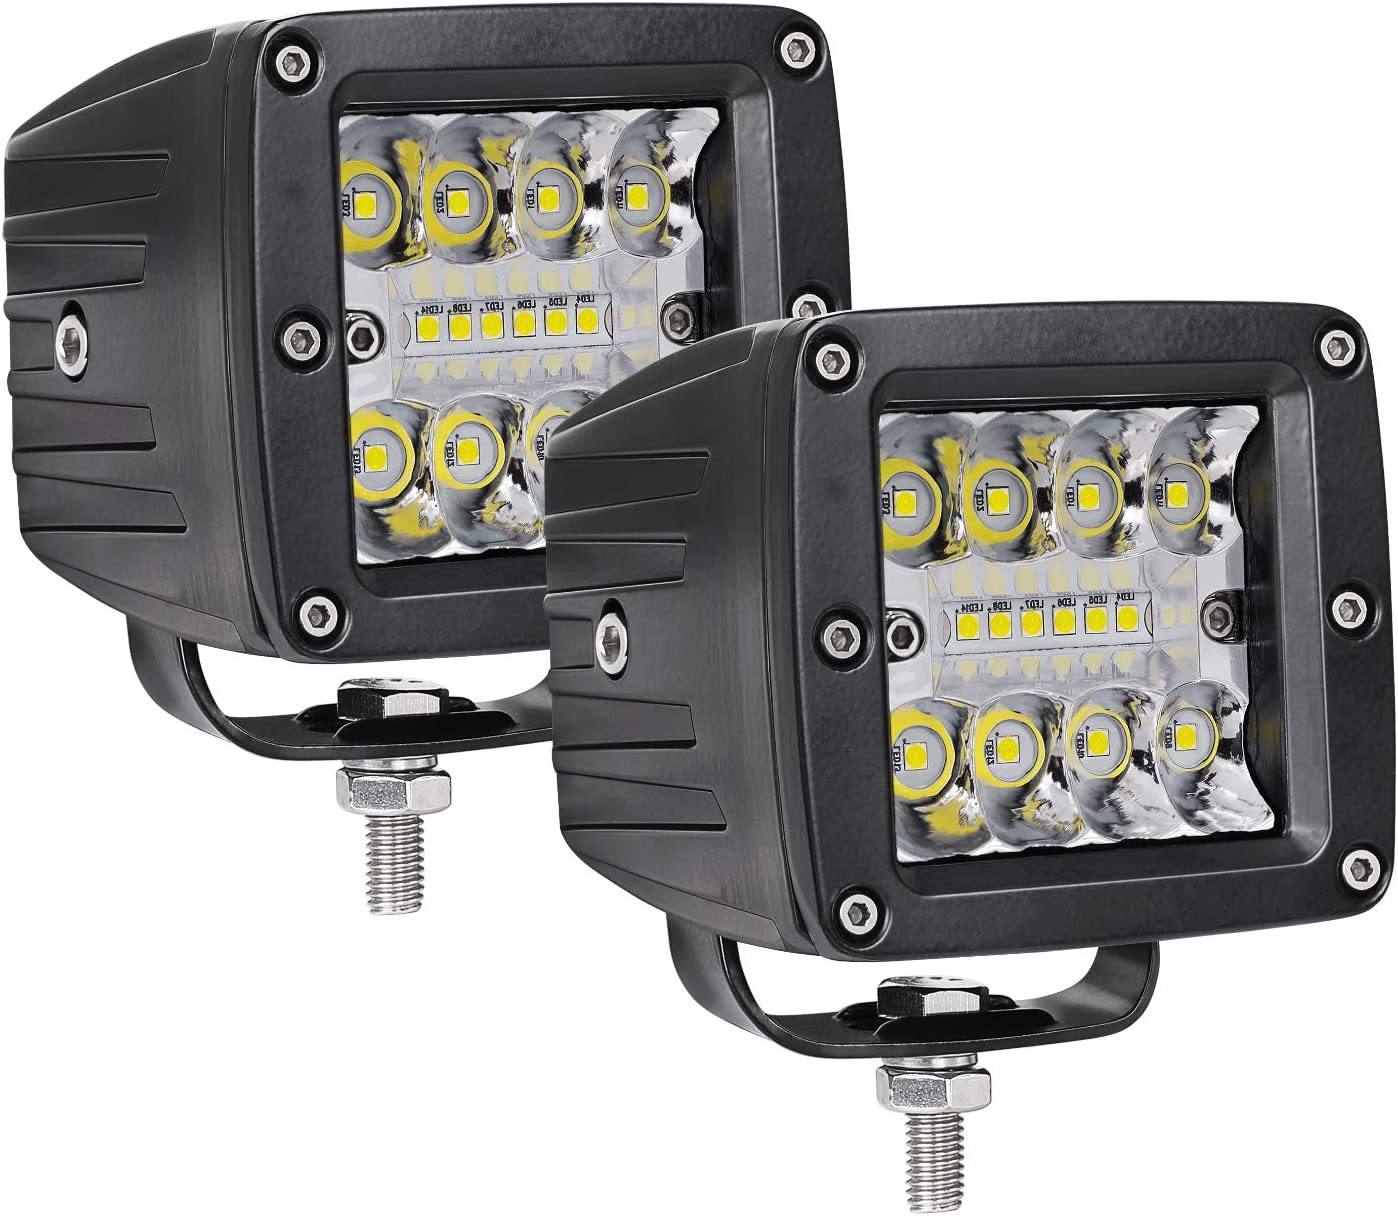 2PCS 3 Inch 84W CREE Off Road Driving Lights LED Pod Lights Combo Spot Flood LED Work Light Bars Square Fog Lights for Truck SUV ATV UTV Car Boat Niwaker LED Cubes